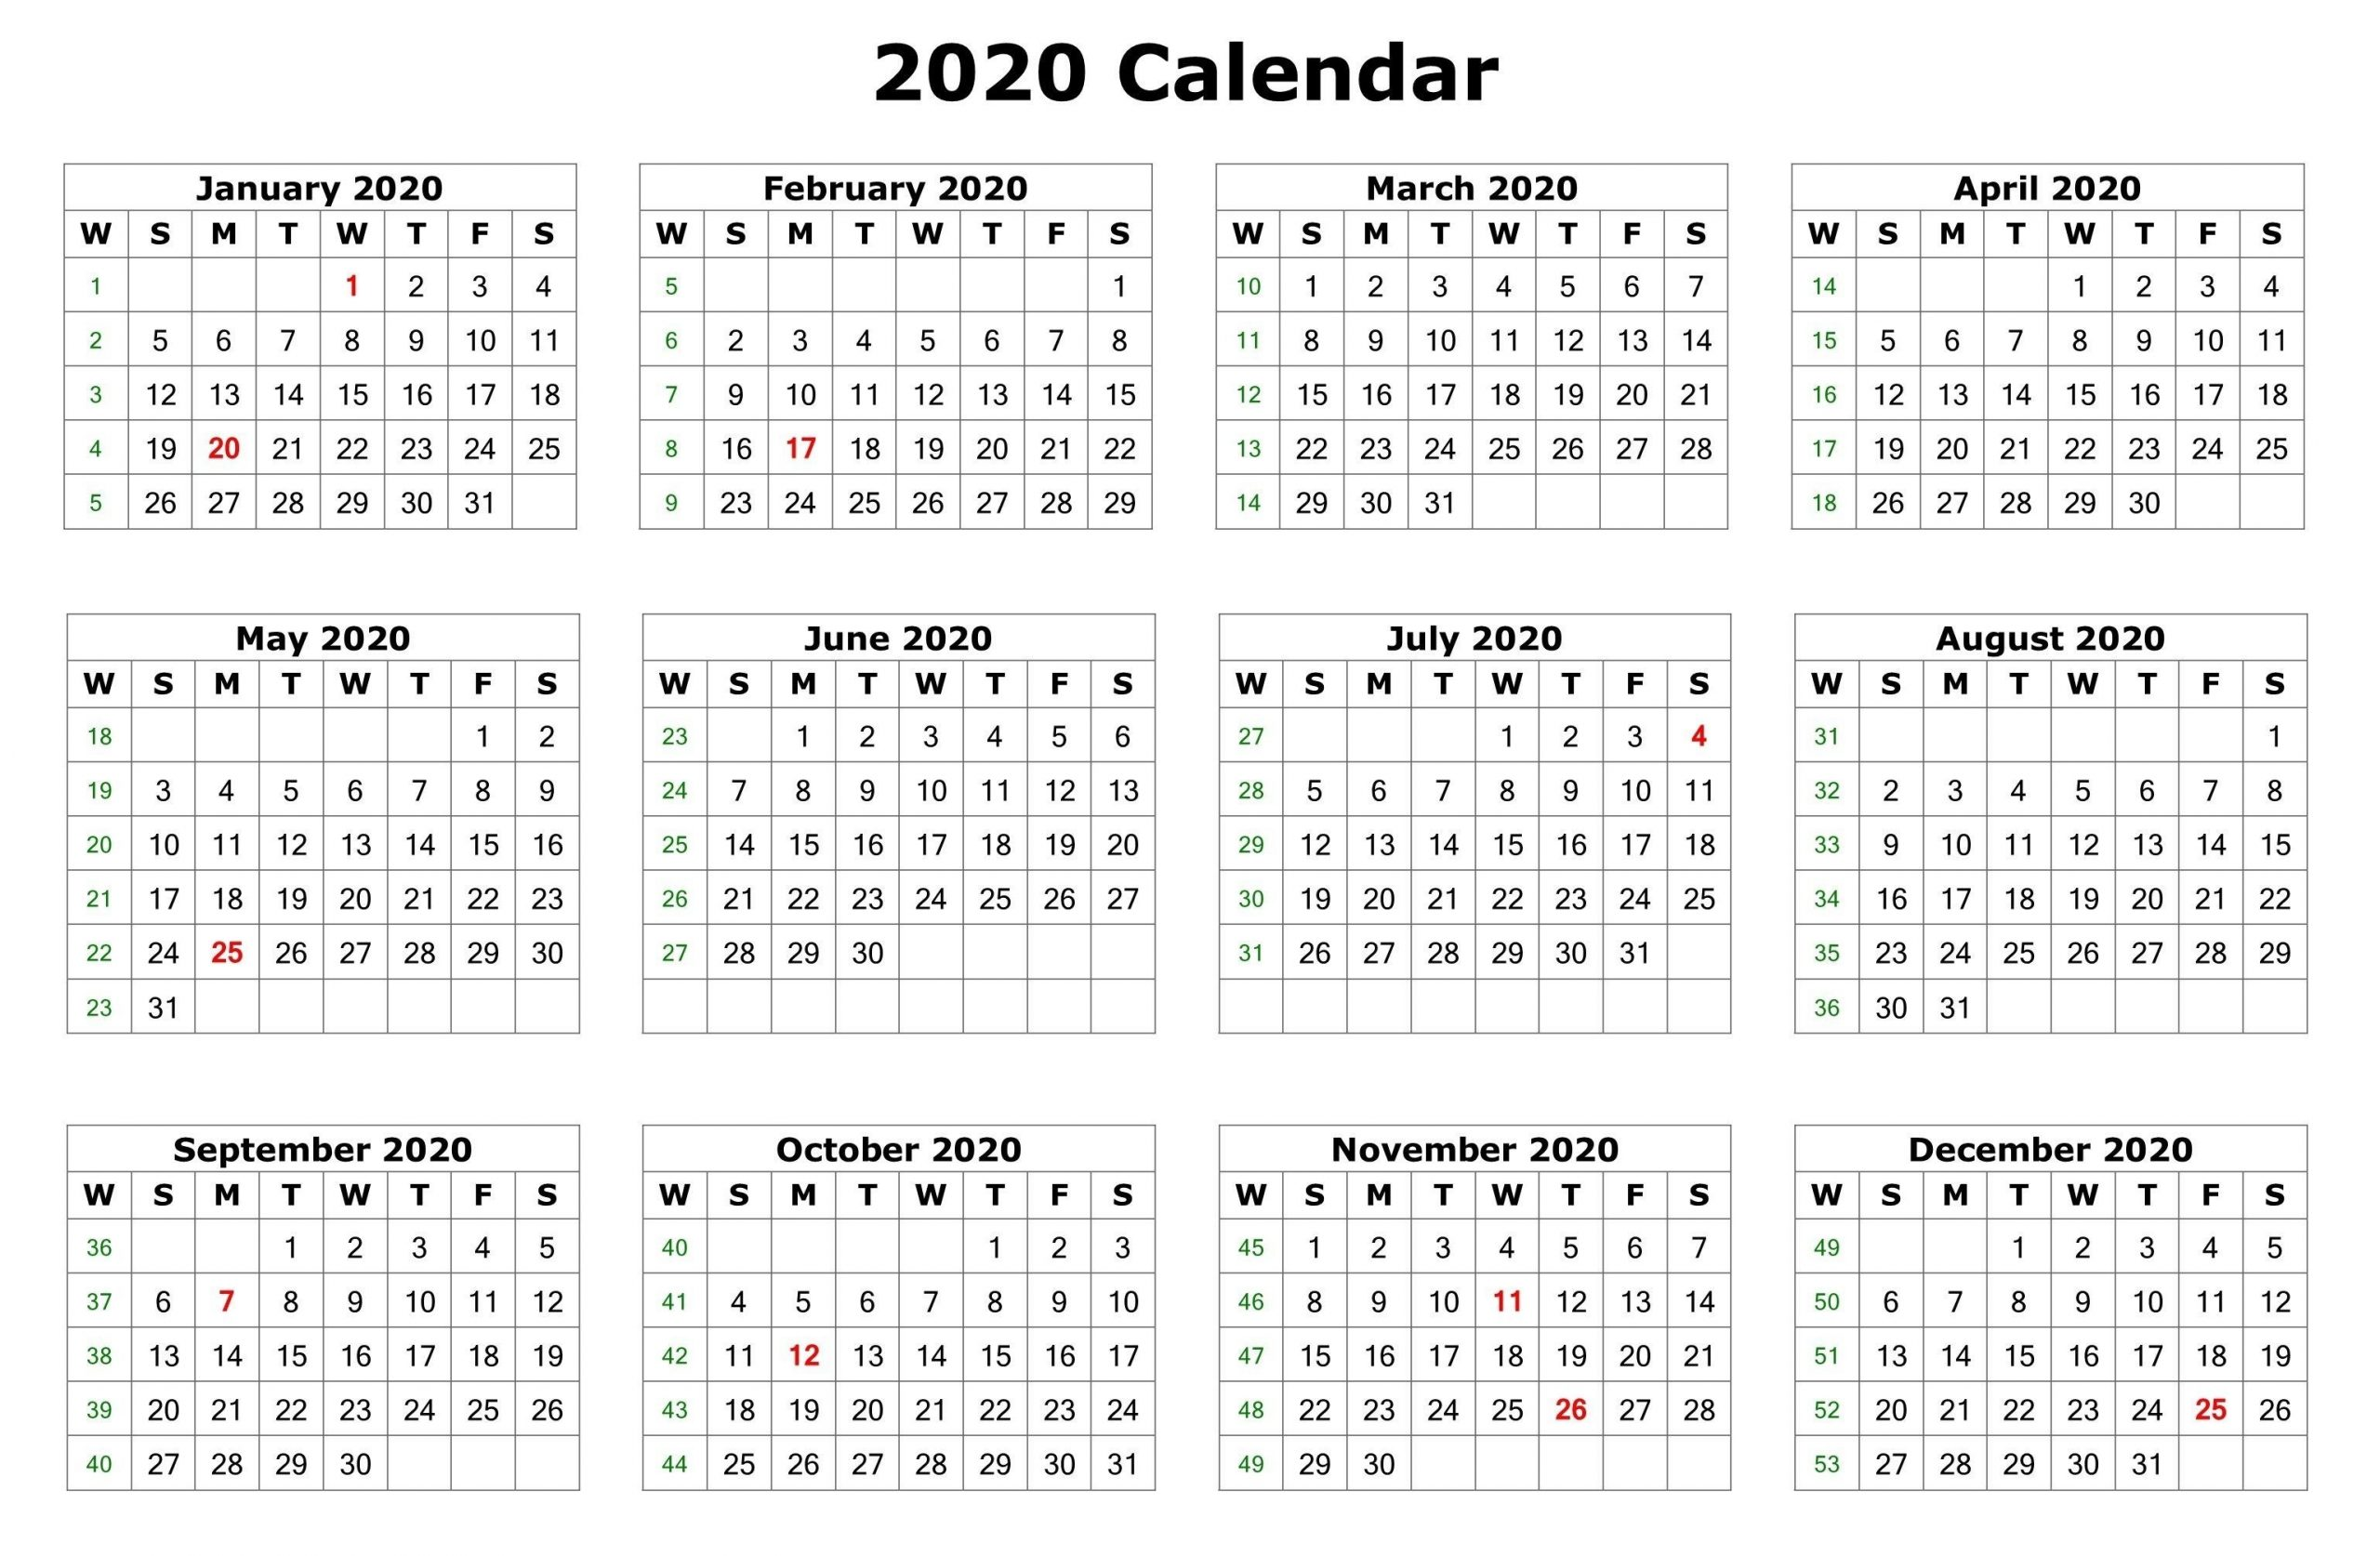 2020 One Page Calendar Printable | Calendar 2020 | 12 Month  Free Printable Calendar 12 Months